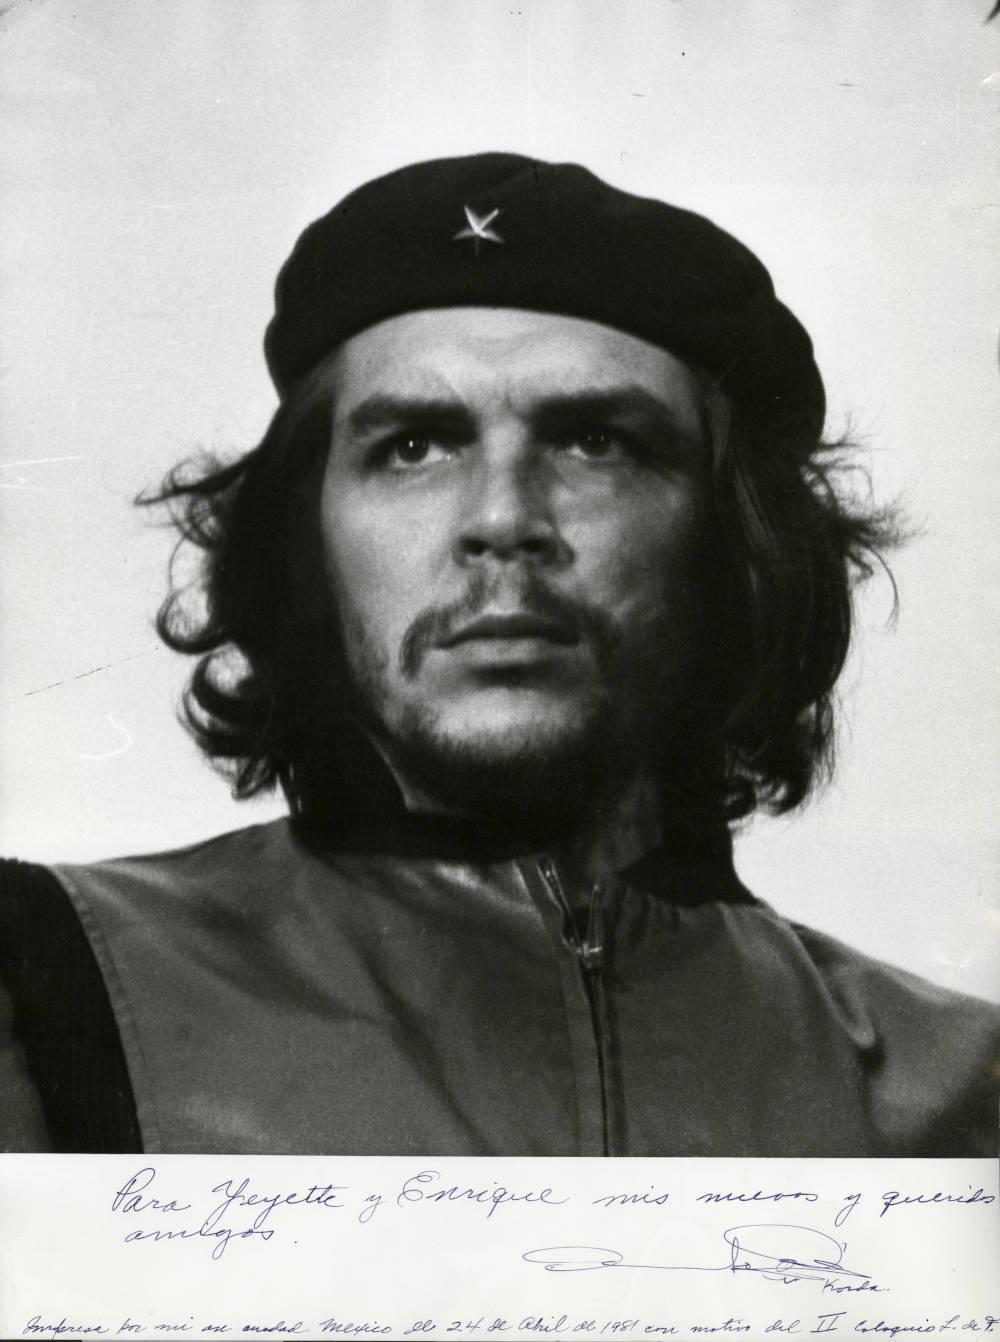 Alberto Korda, Heroic Guerilla Fighter, Cuba, 1960 © Alberto Korda Estate. Courtesy of the artists estate